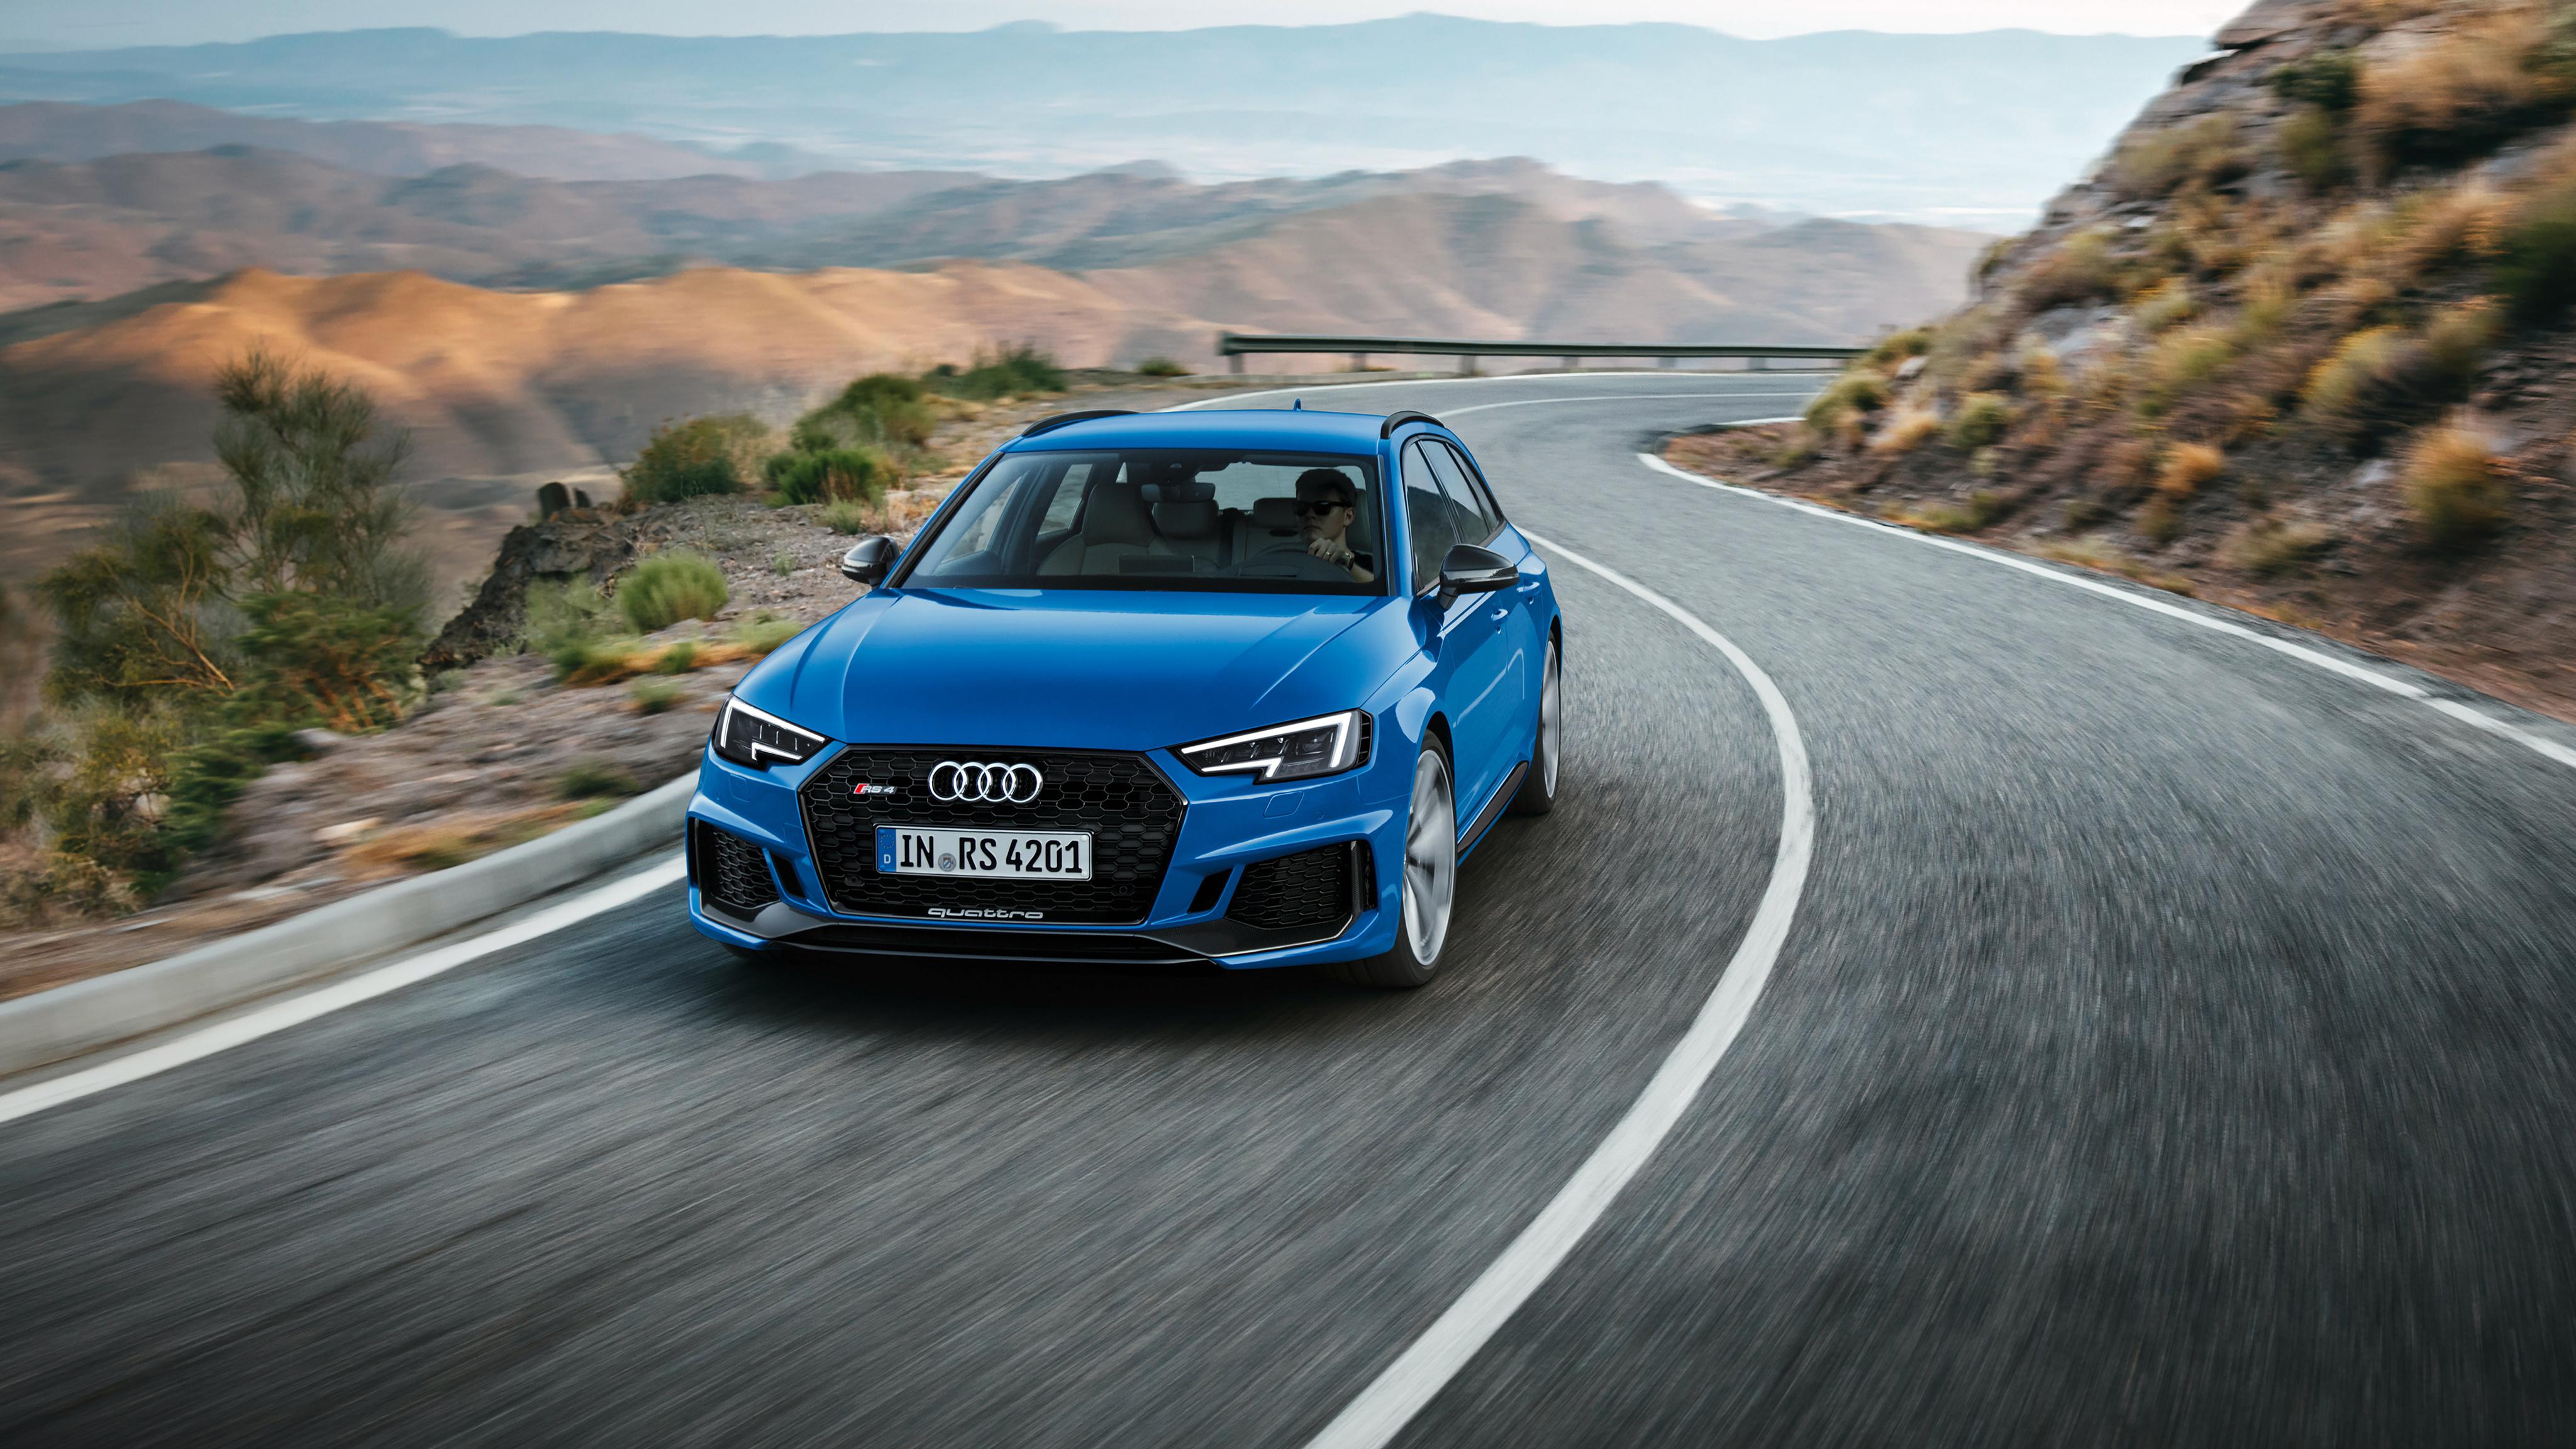 2018 Audi Rs4 Avant 2 Wallpaper Hd Car Wallpapers Id 8592